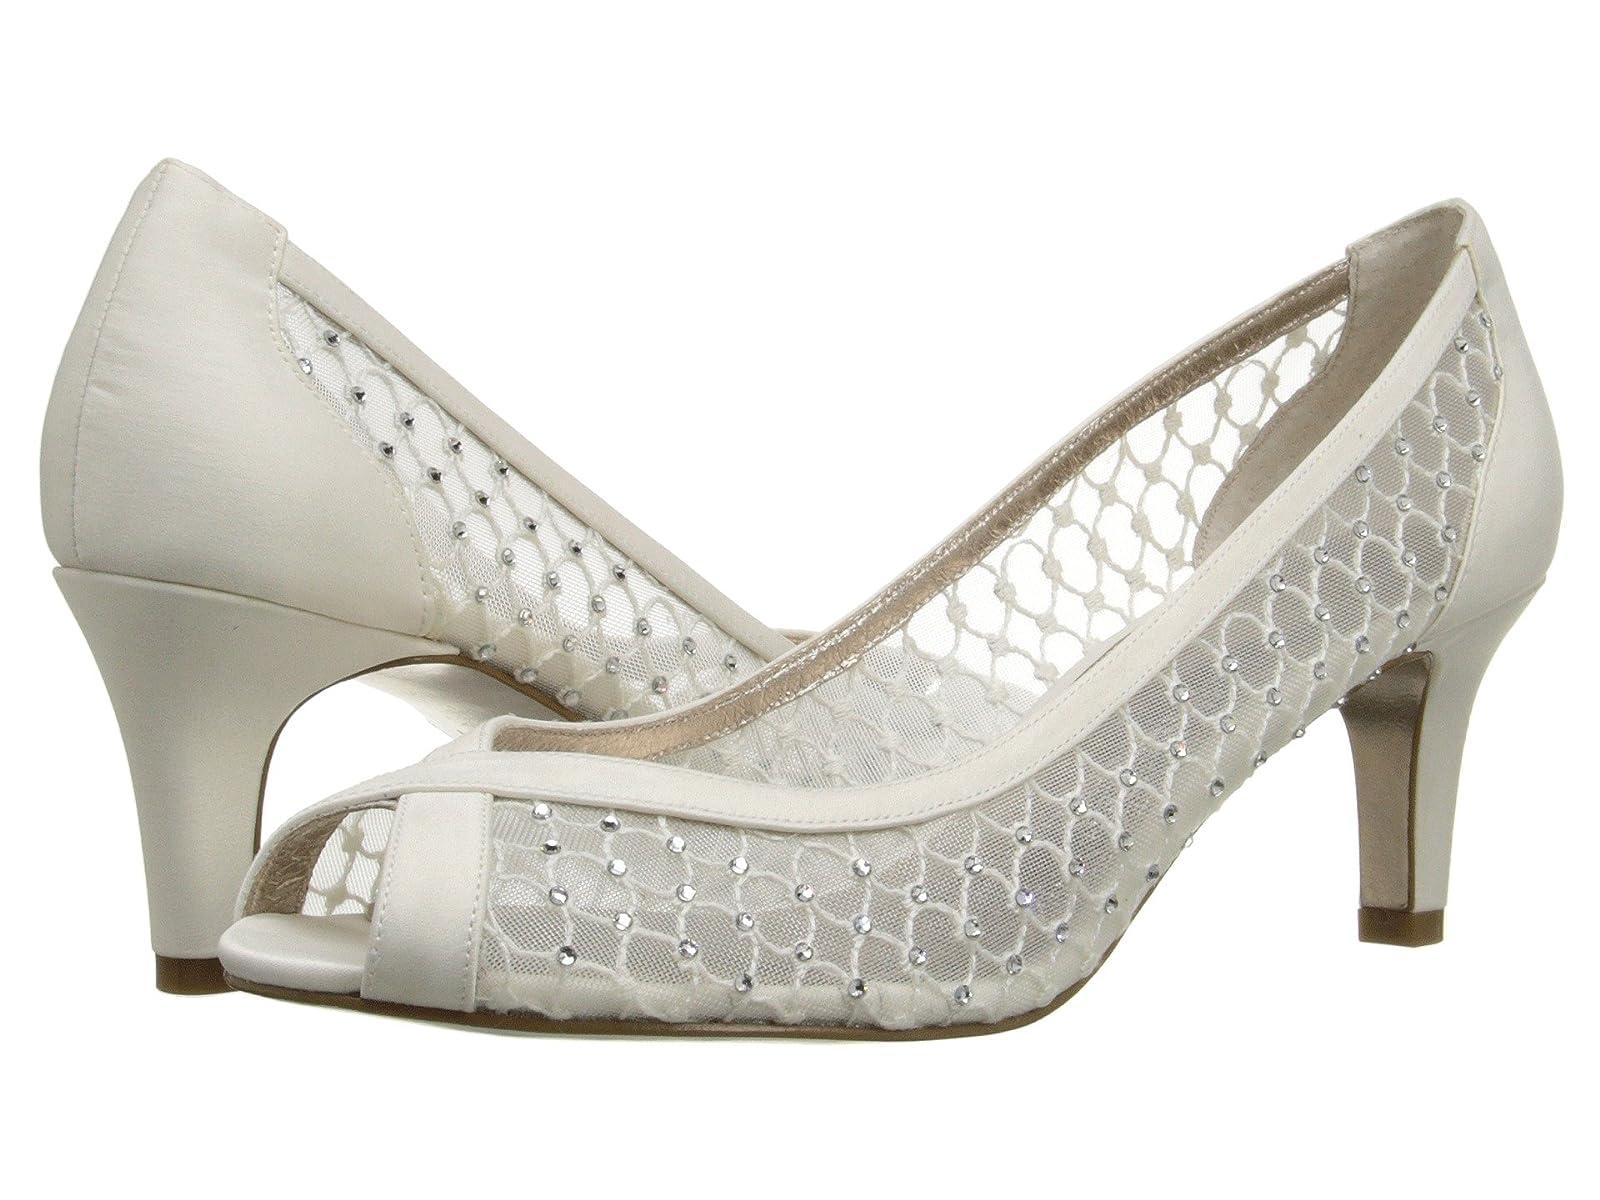 Adrianna Papell ZandraCheap and distinctive eye-catching shoes